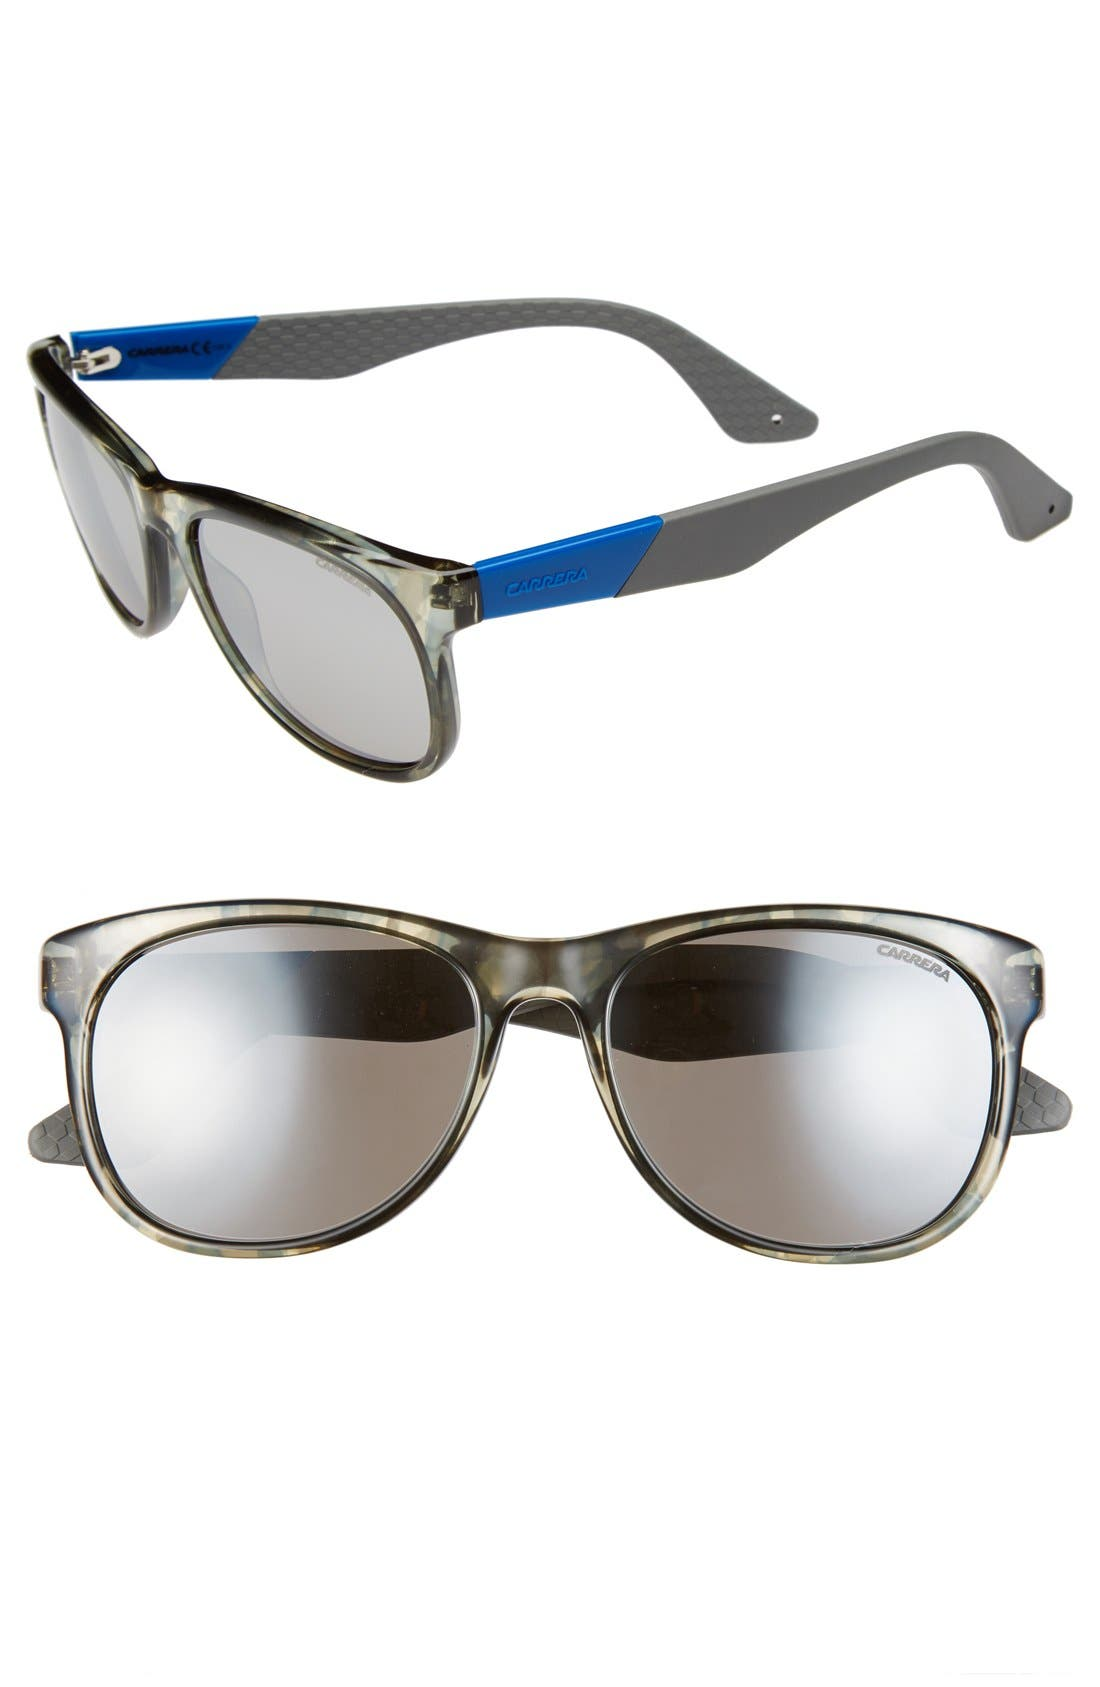 Alternate Image 1 Selected - Carrera Eyewear 55mm Retro Sunglasses